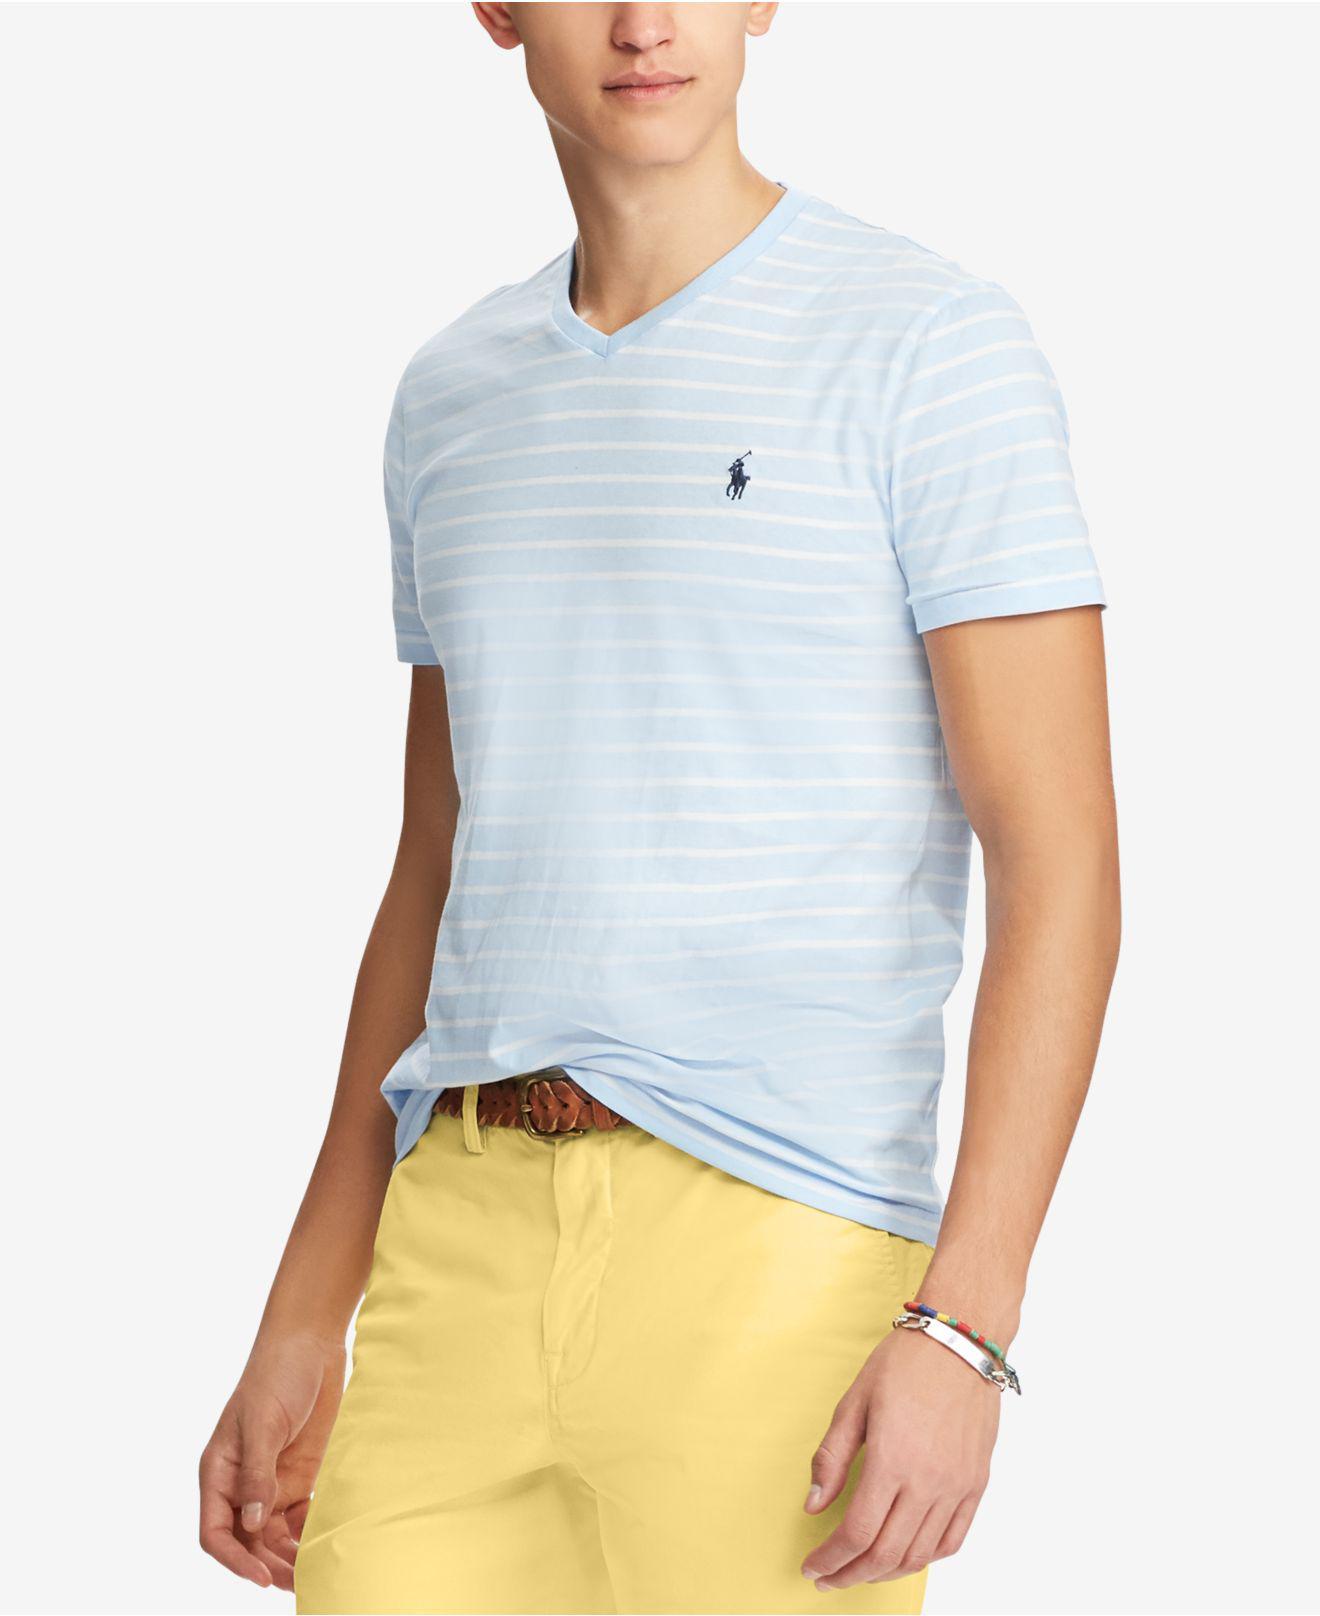 2c2c7dd3 Macys Polo Ralph Lauren T Shirts - Nils Stucki Kieferorthopäde